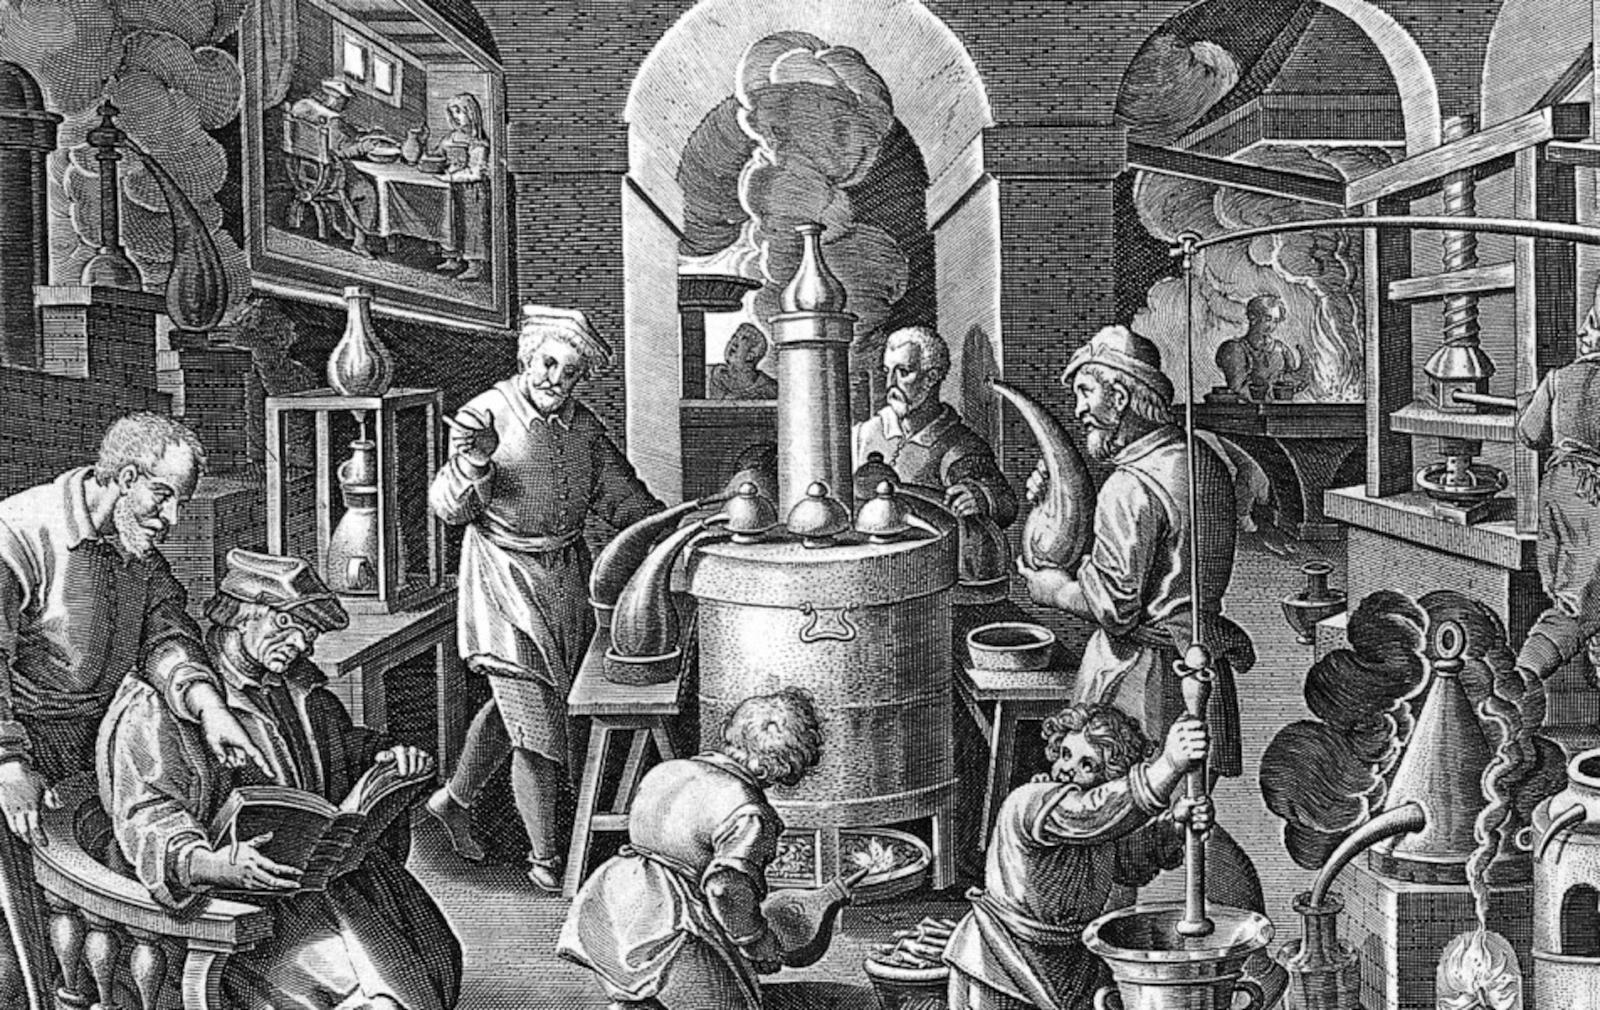 Heritage & Distillation